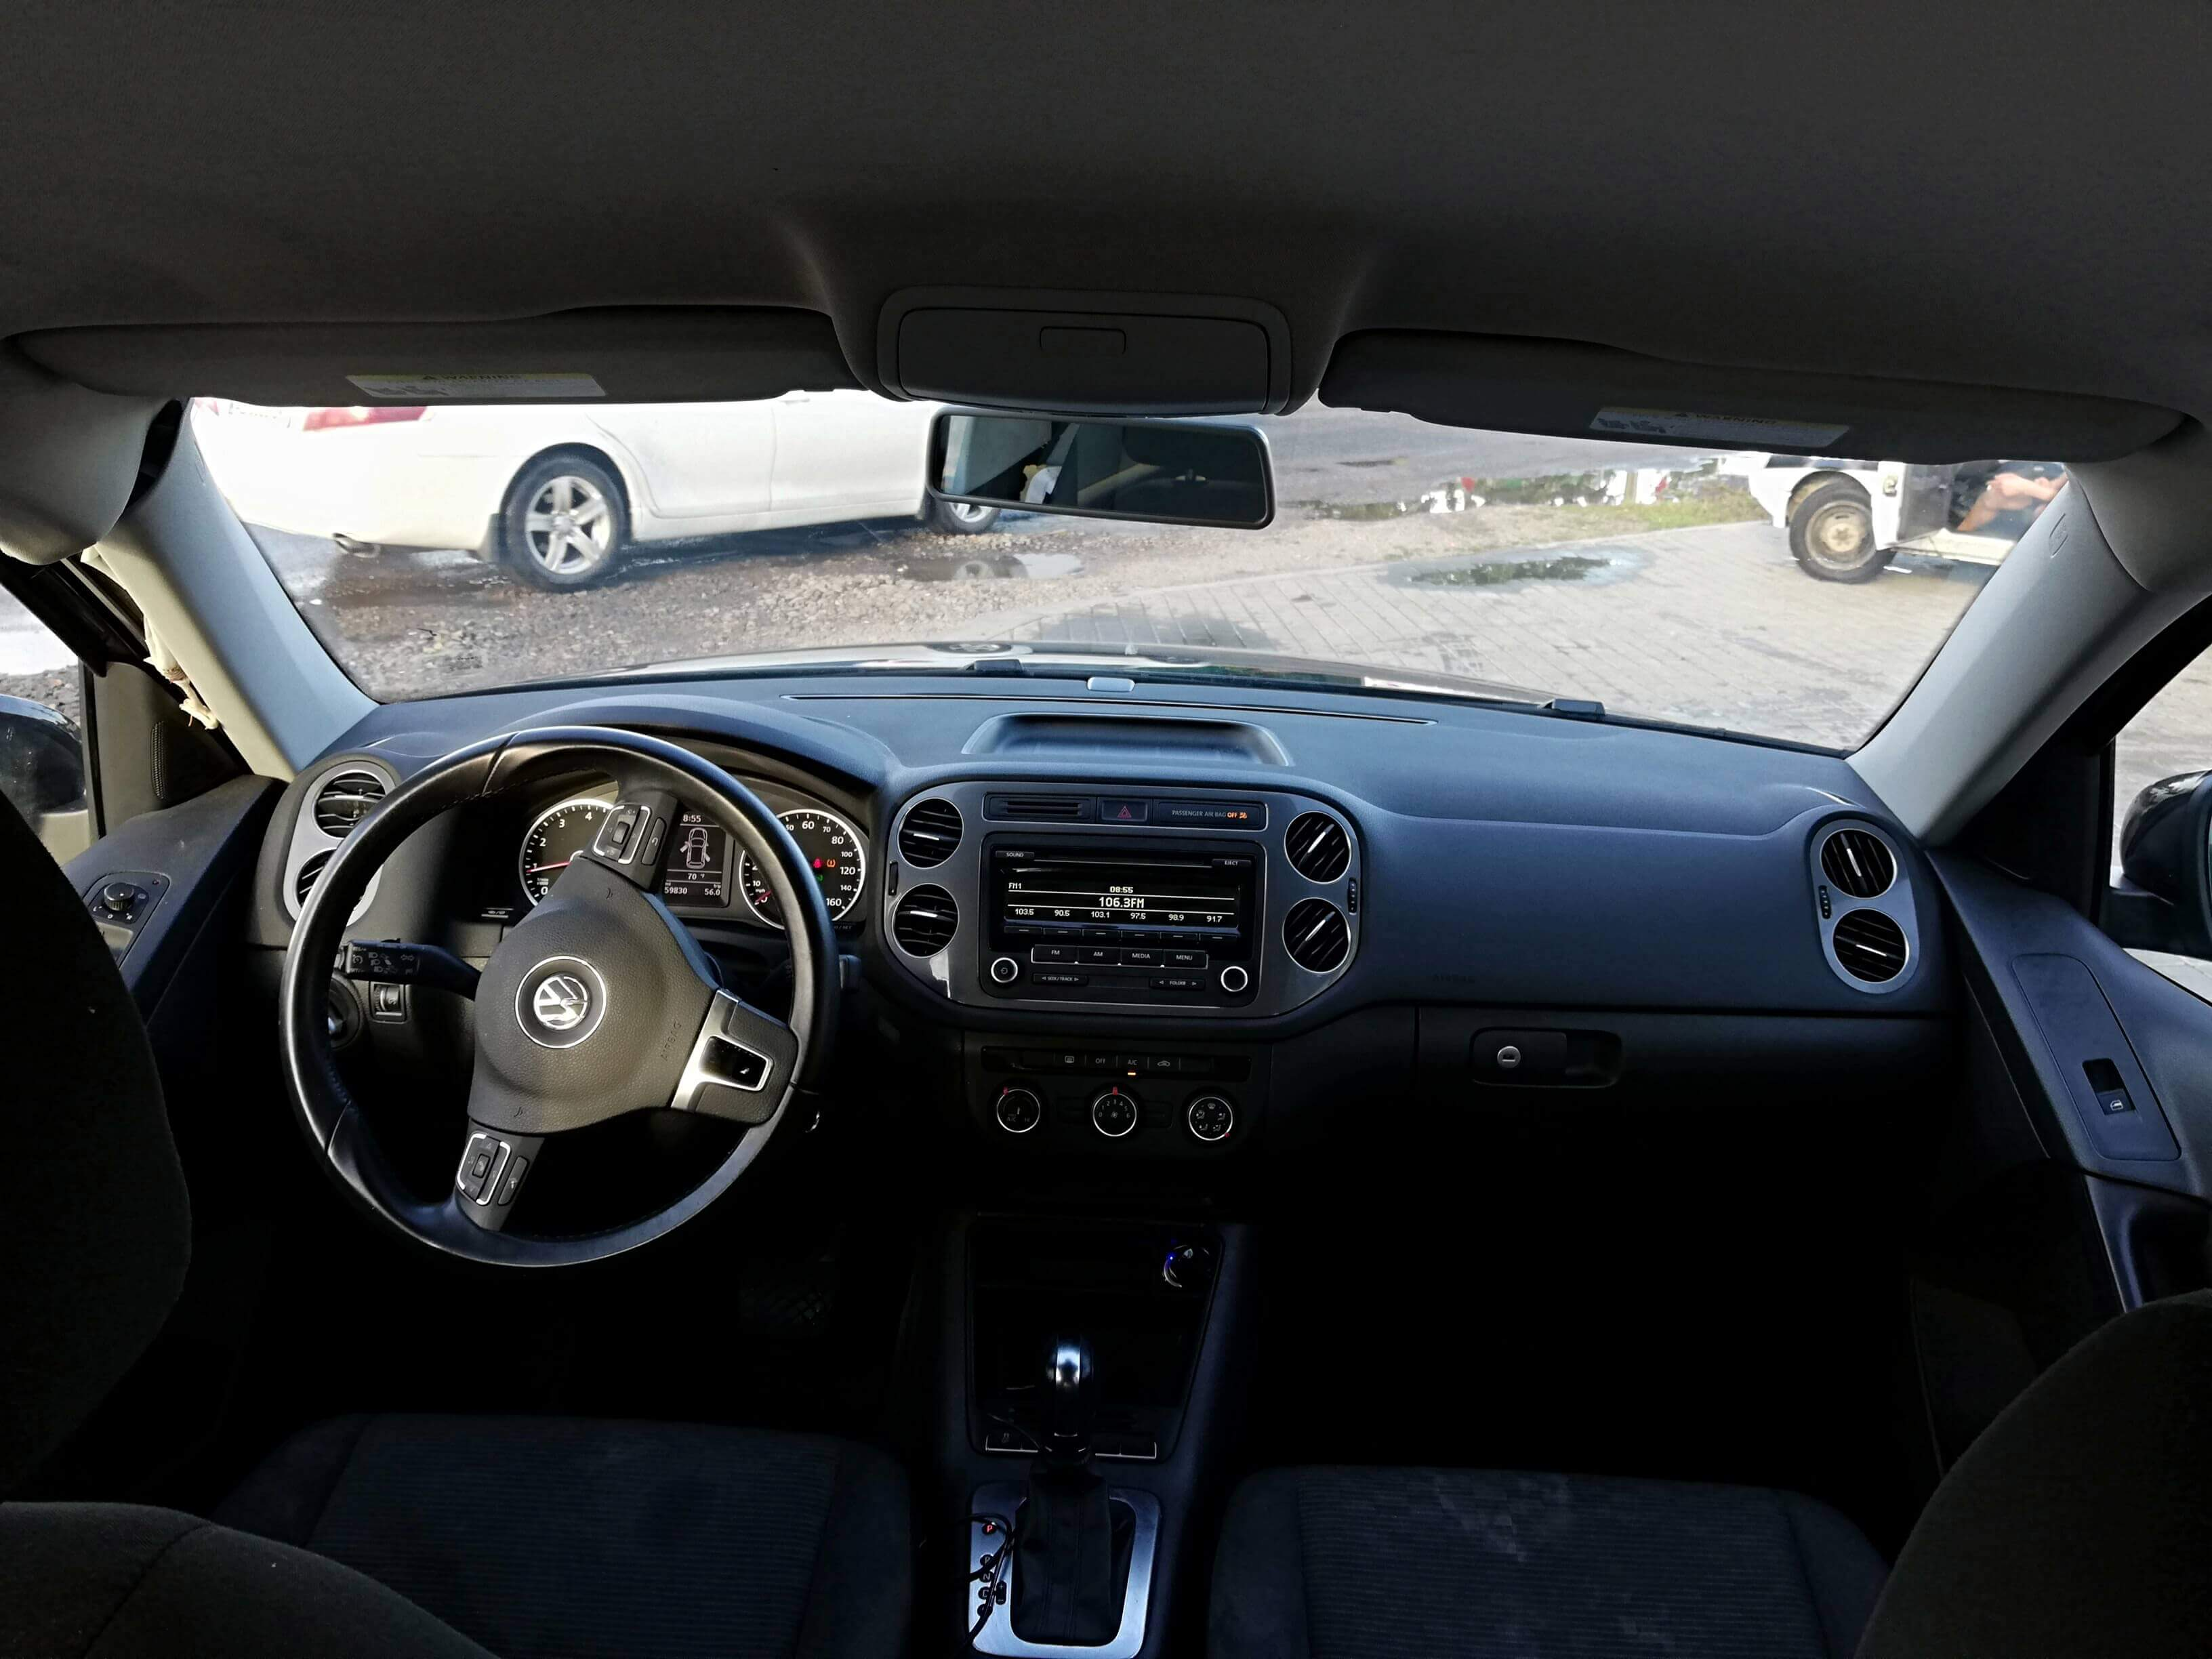 Volkswagen Tiguan купить бу в Украине